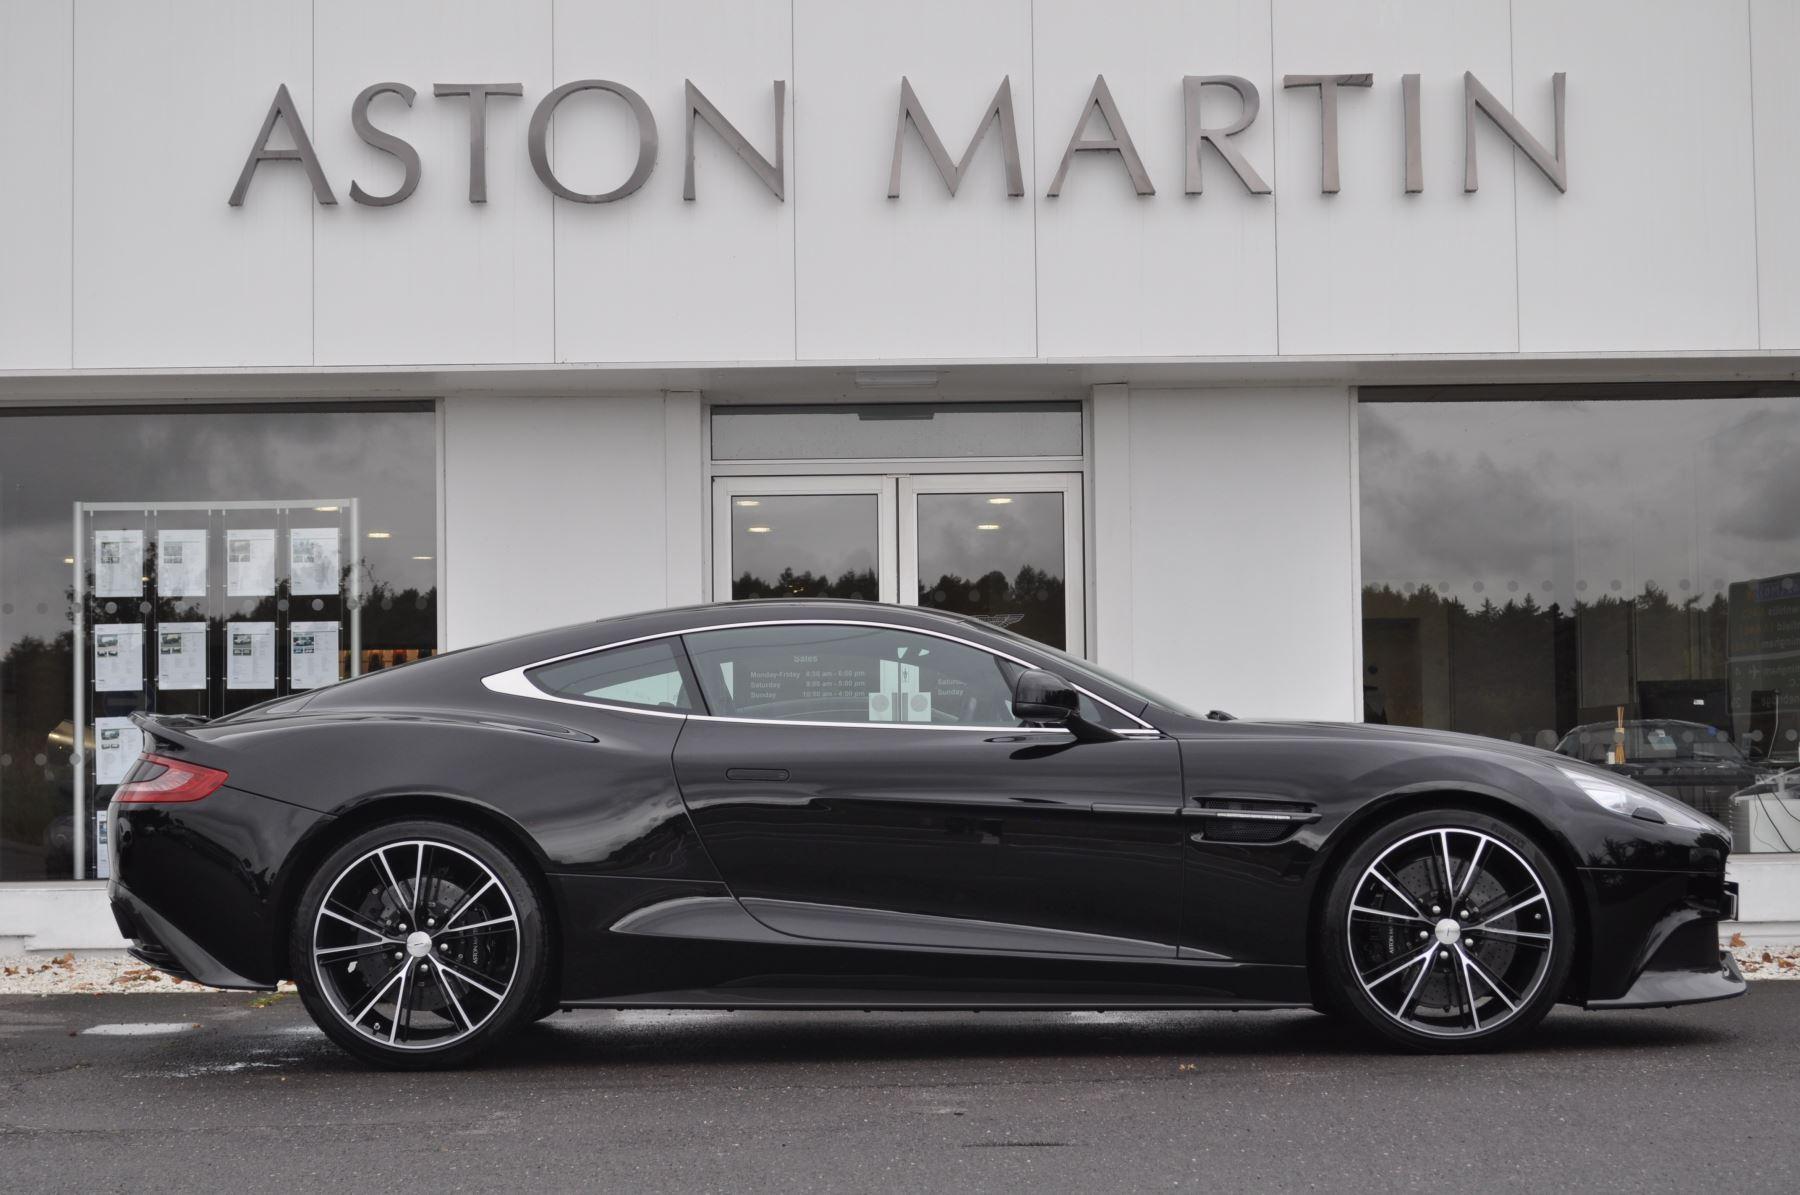 Aston Martin Vanquish V12 [568] 2+2 2dr Touchtronic image 4